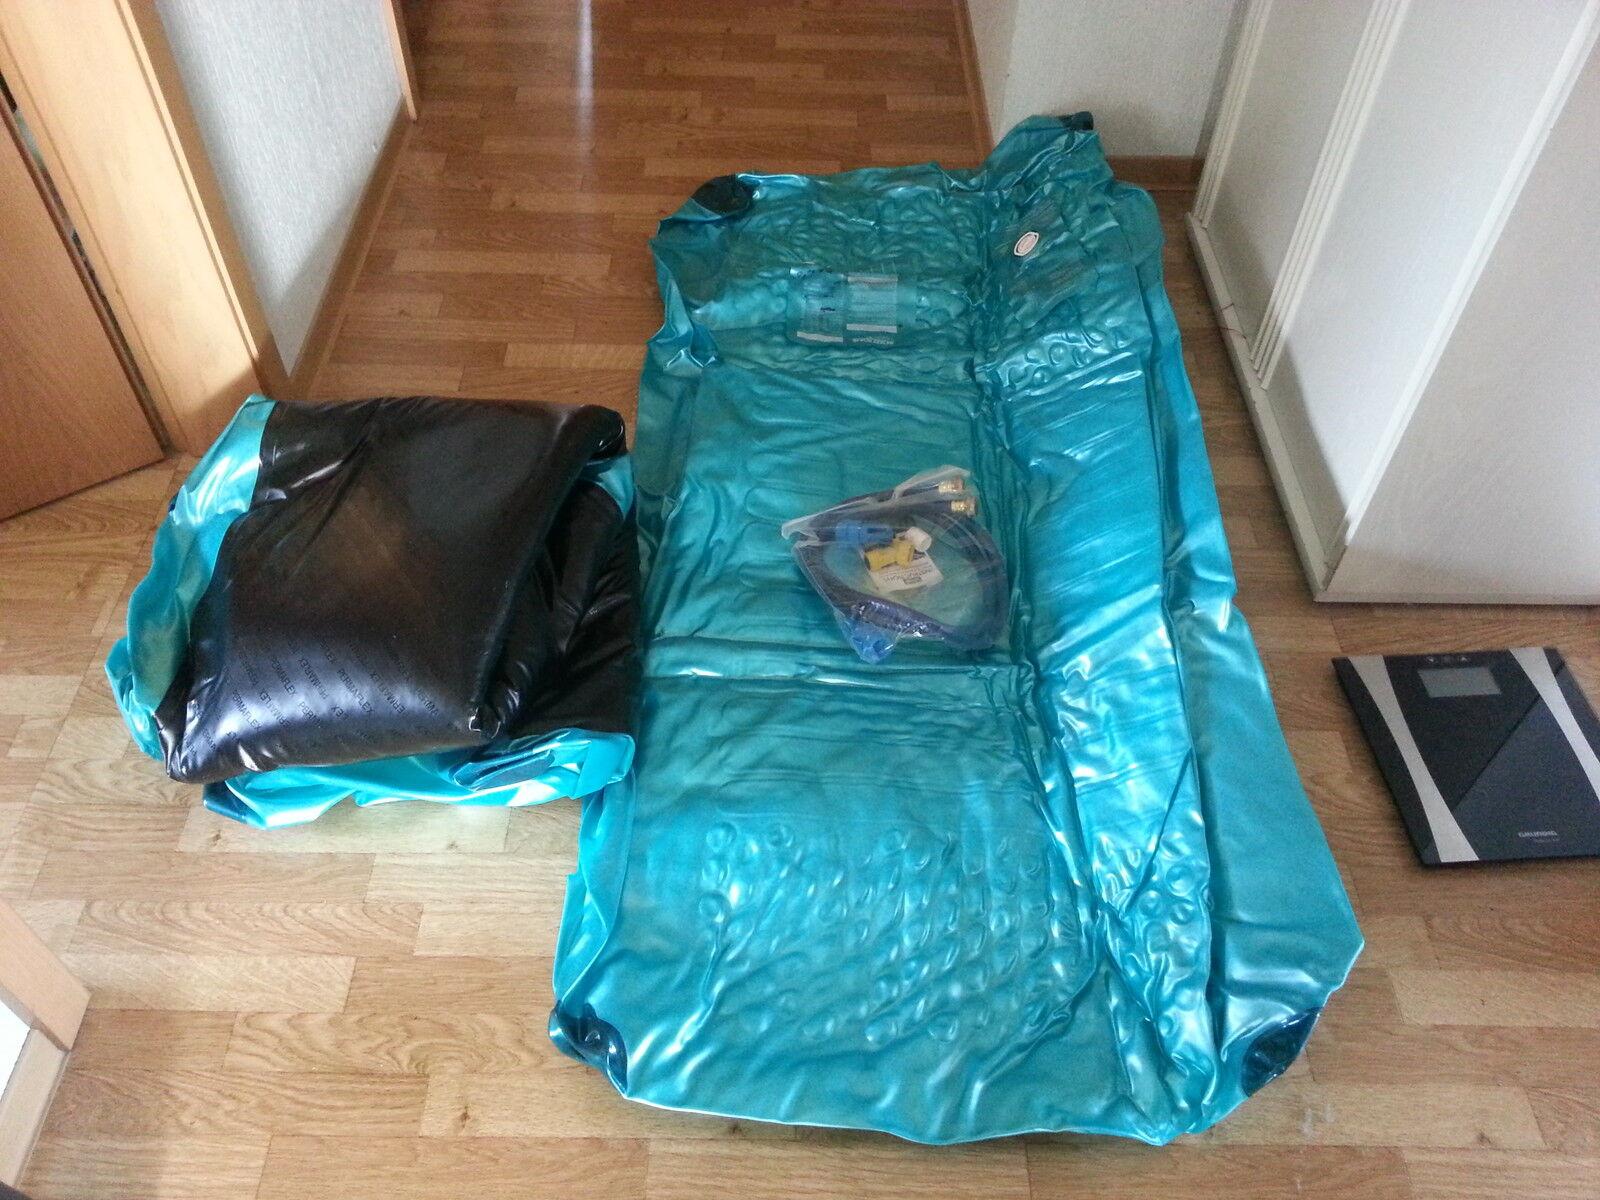 Komplettes Softside Wasserbett Badytone Comfort 5000 Neu 2m x 1,8 m